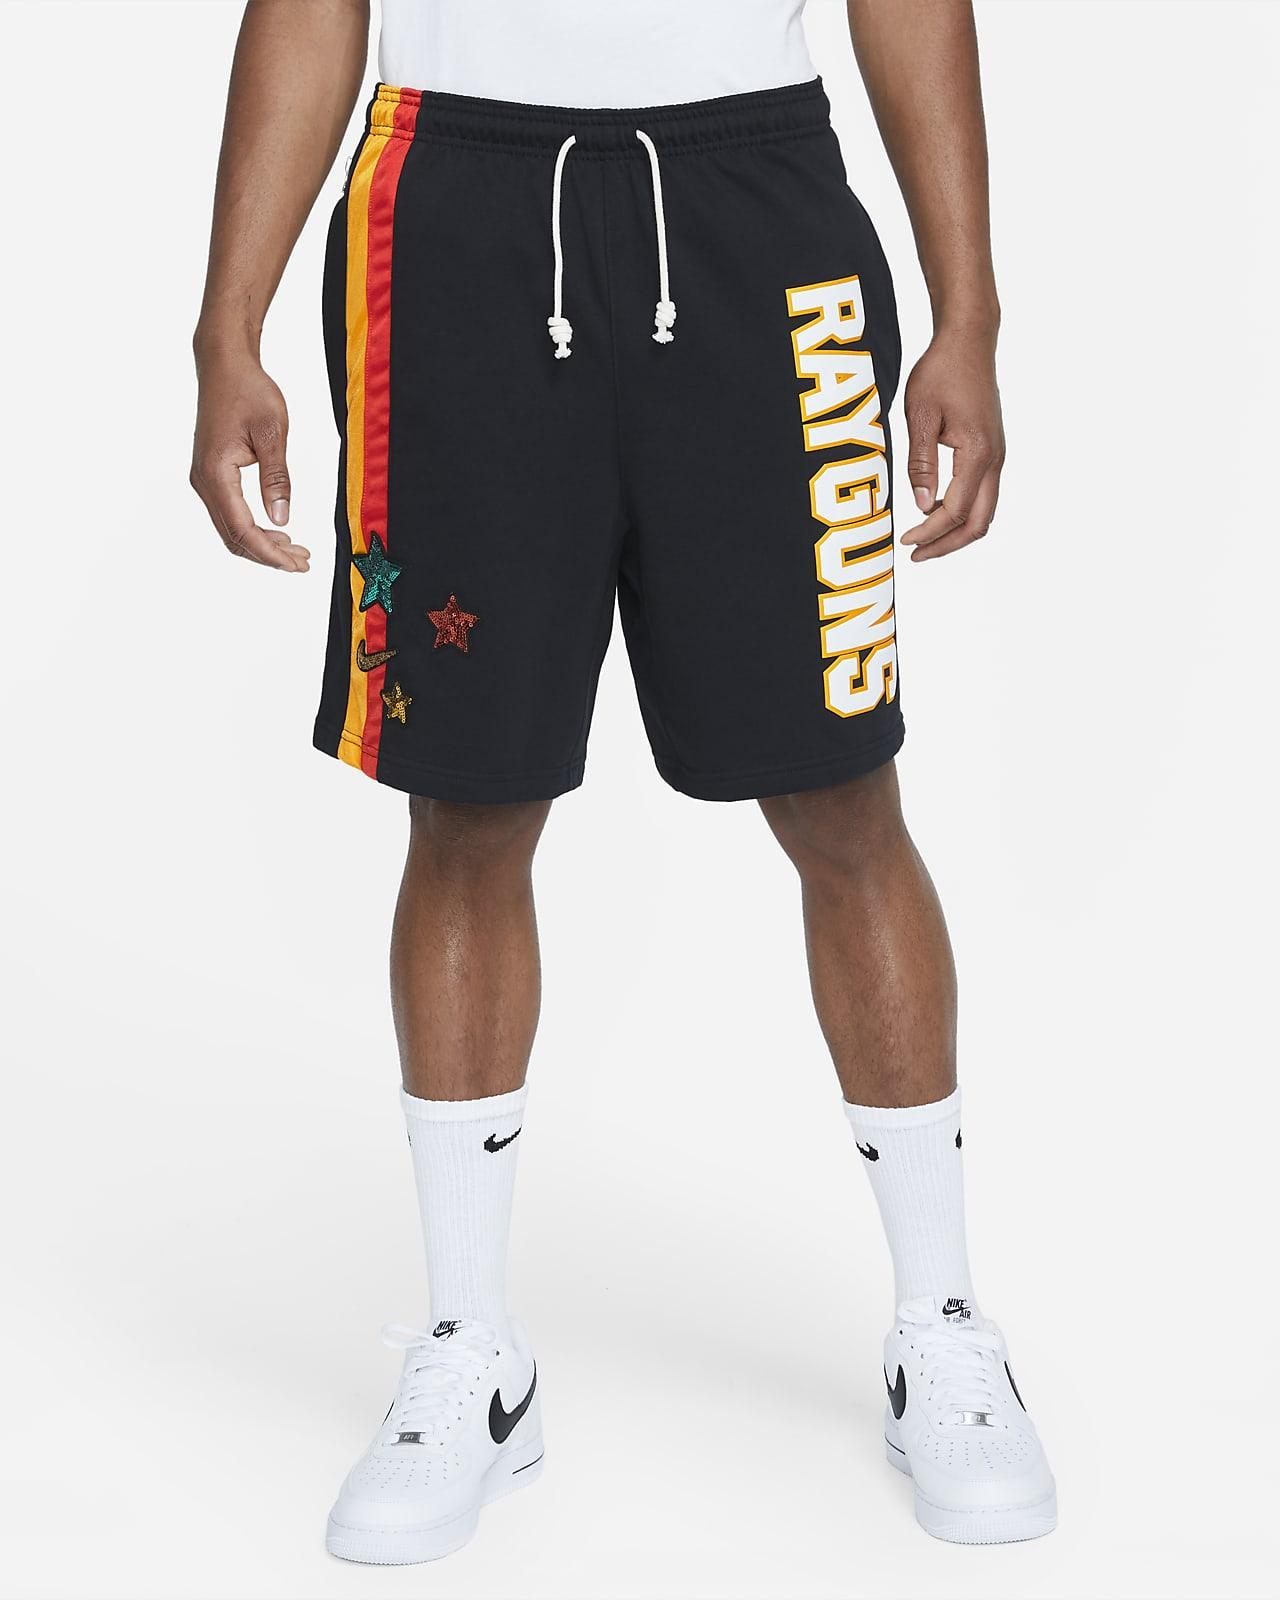 Nike Dri-FIT Rayguns Pantalons curts de bàsquet prèmium - Home